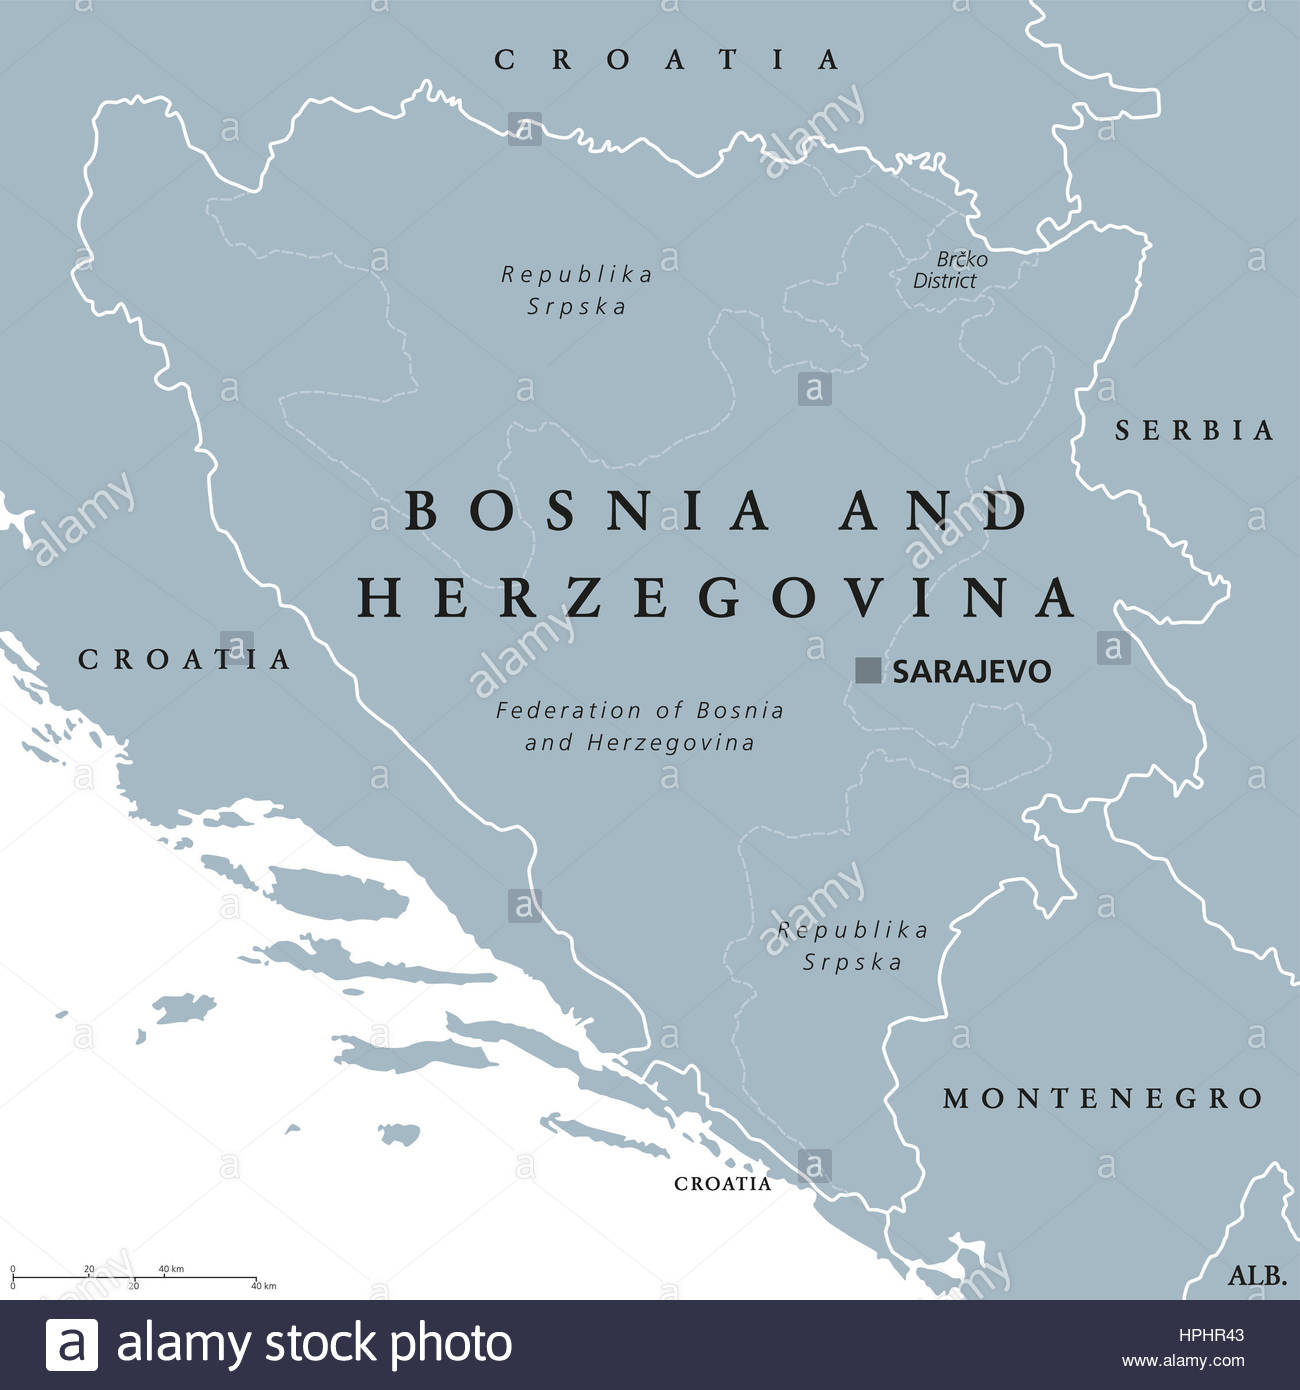 La Bosnie-Et-Herzégovine Sarajevo, Capitale De La Carte intérieur Pays Et Capitales D Europe